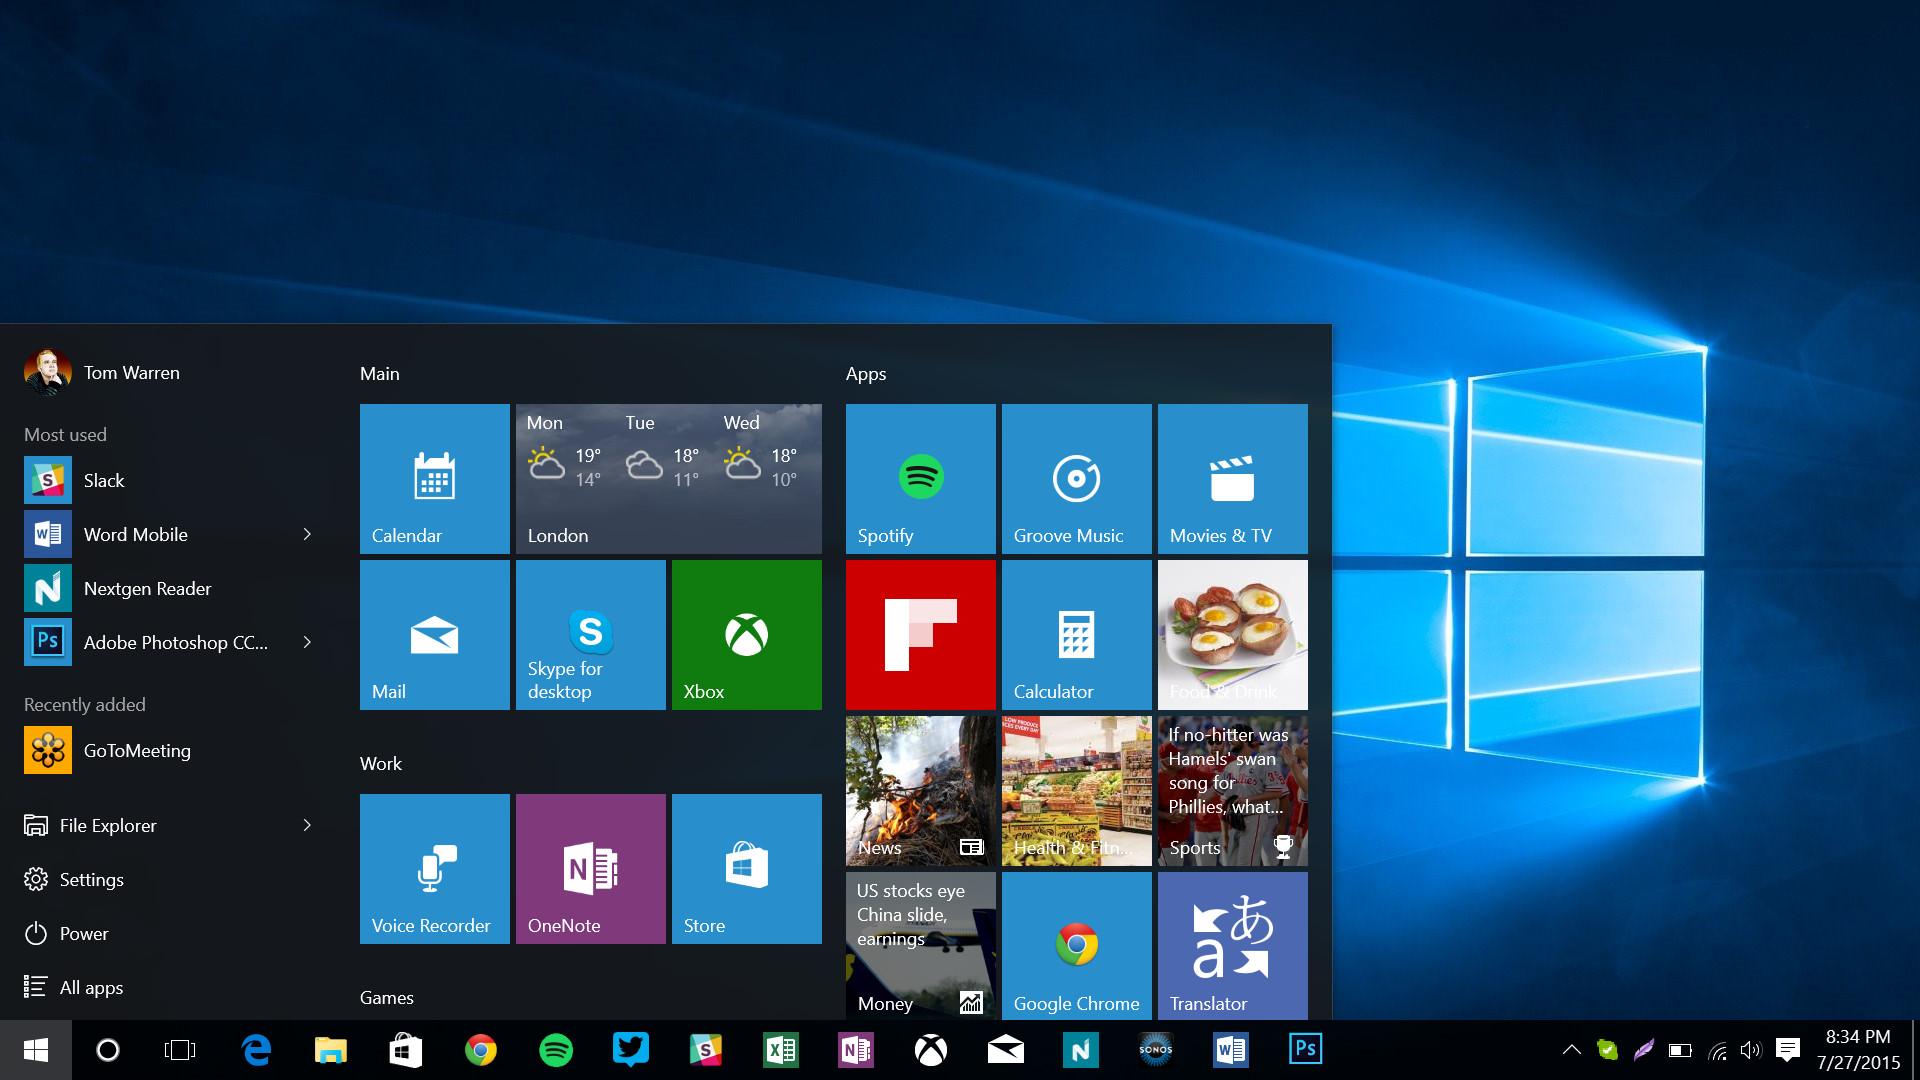 Make Google Calendar Default In Windows 10 How To Use Your Google Calendar In The Windows 10 Calendar App Windows 10 Review The Verge